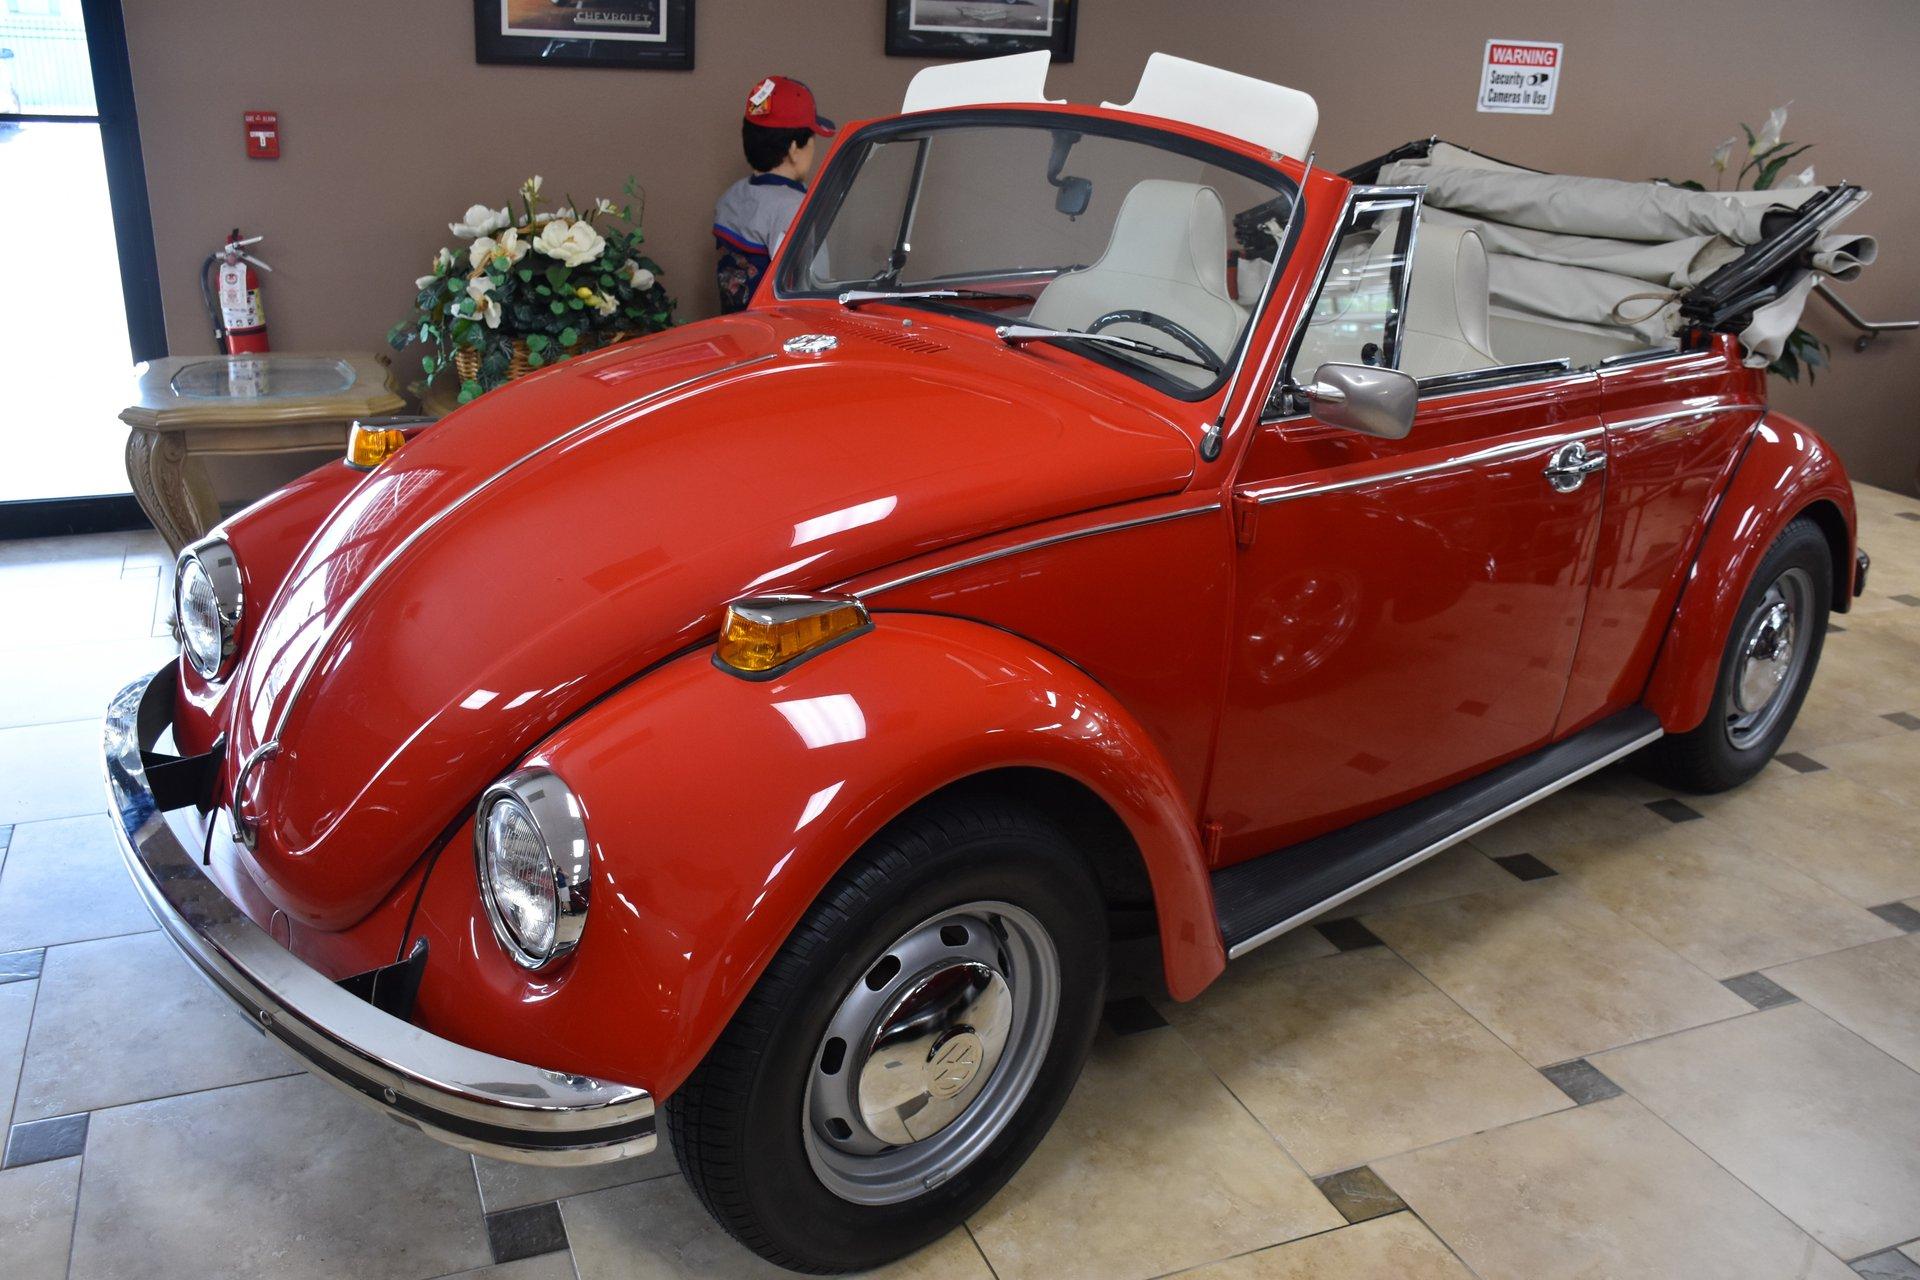 1970 Volkswagen Beetle Ideal Classic Cars Llc